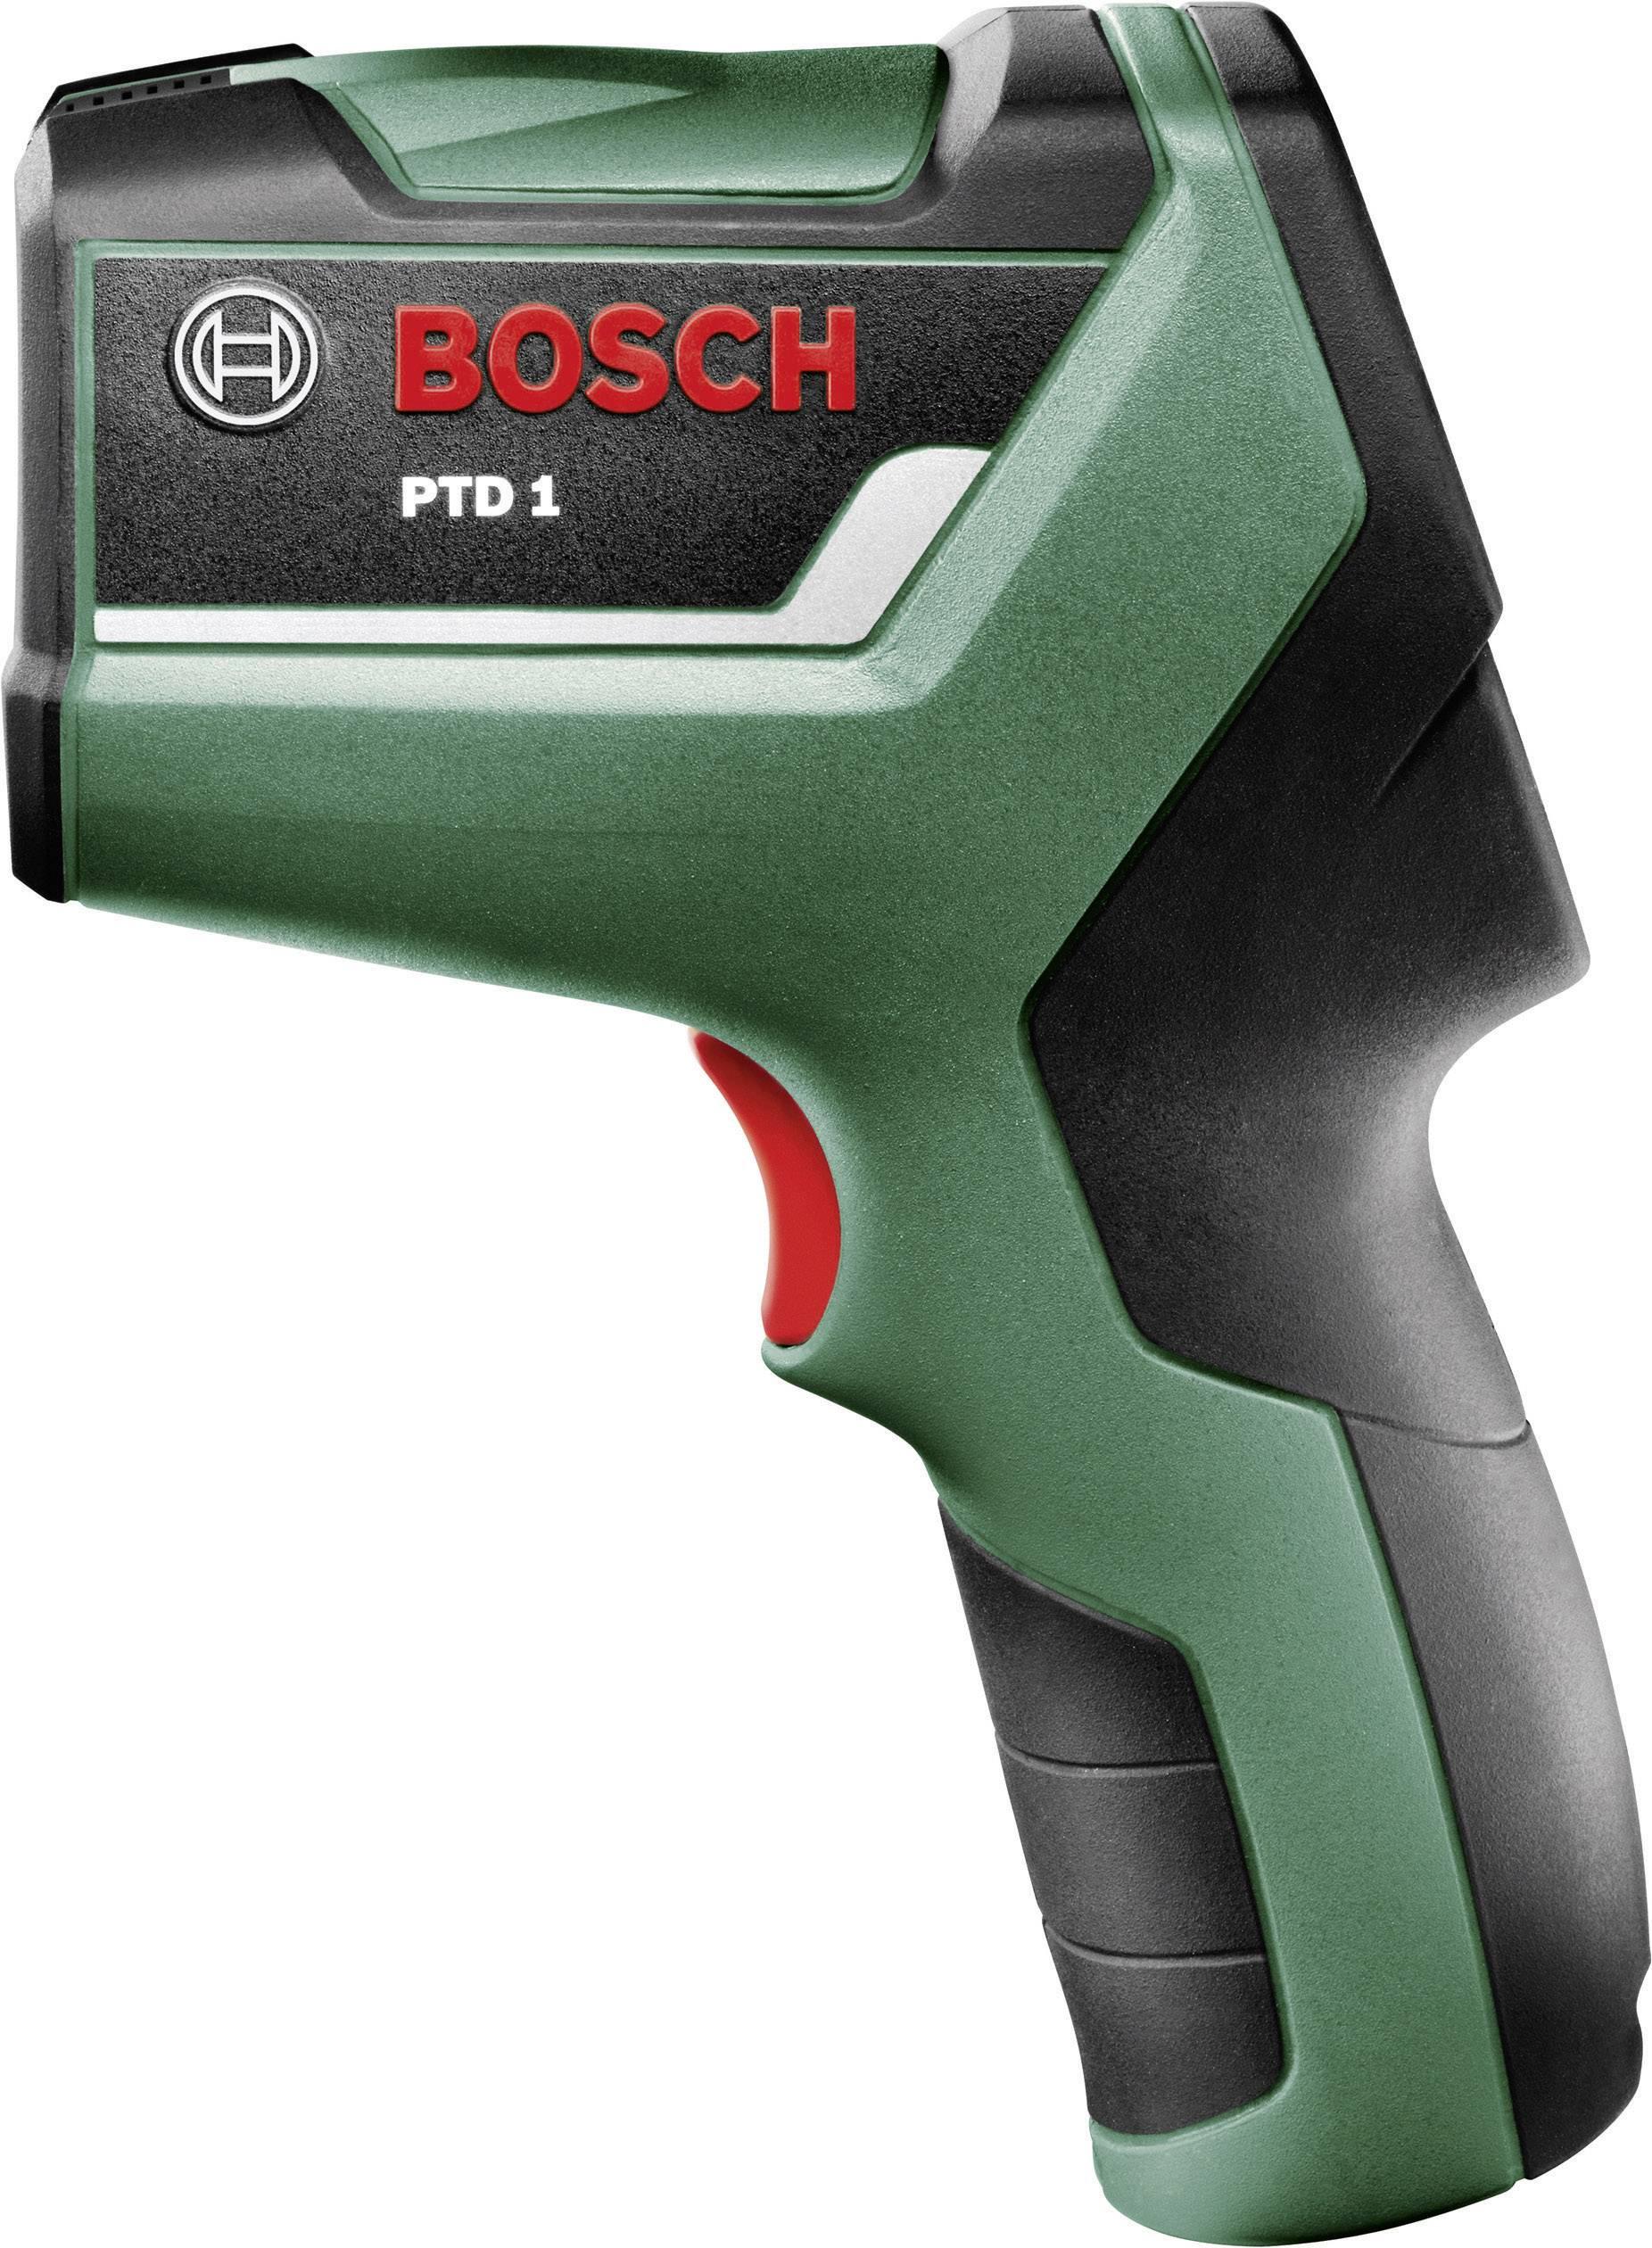 IR teplomer Bosch PTD1, -20 až +200 °C